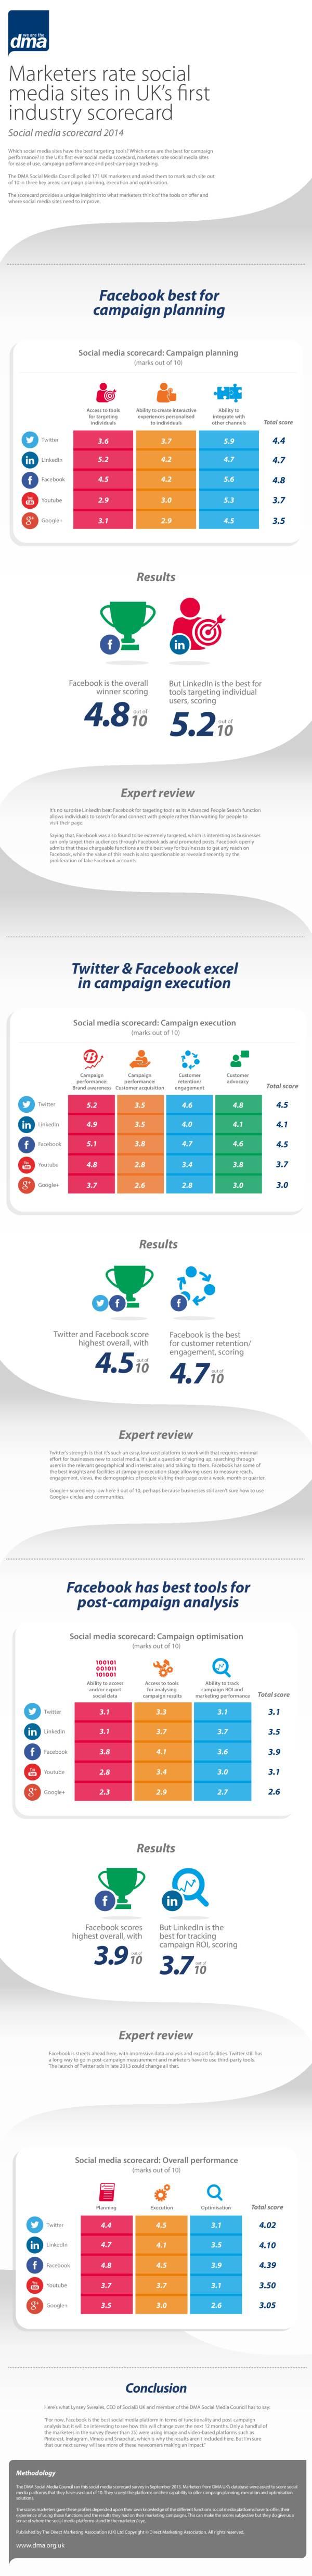 Social Media Scorecard - DMA